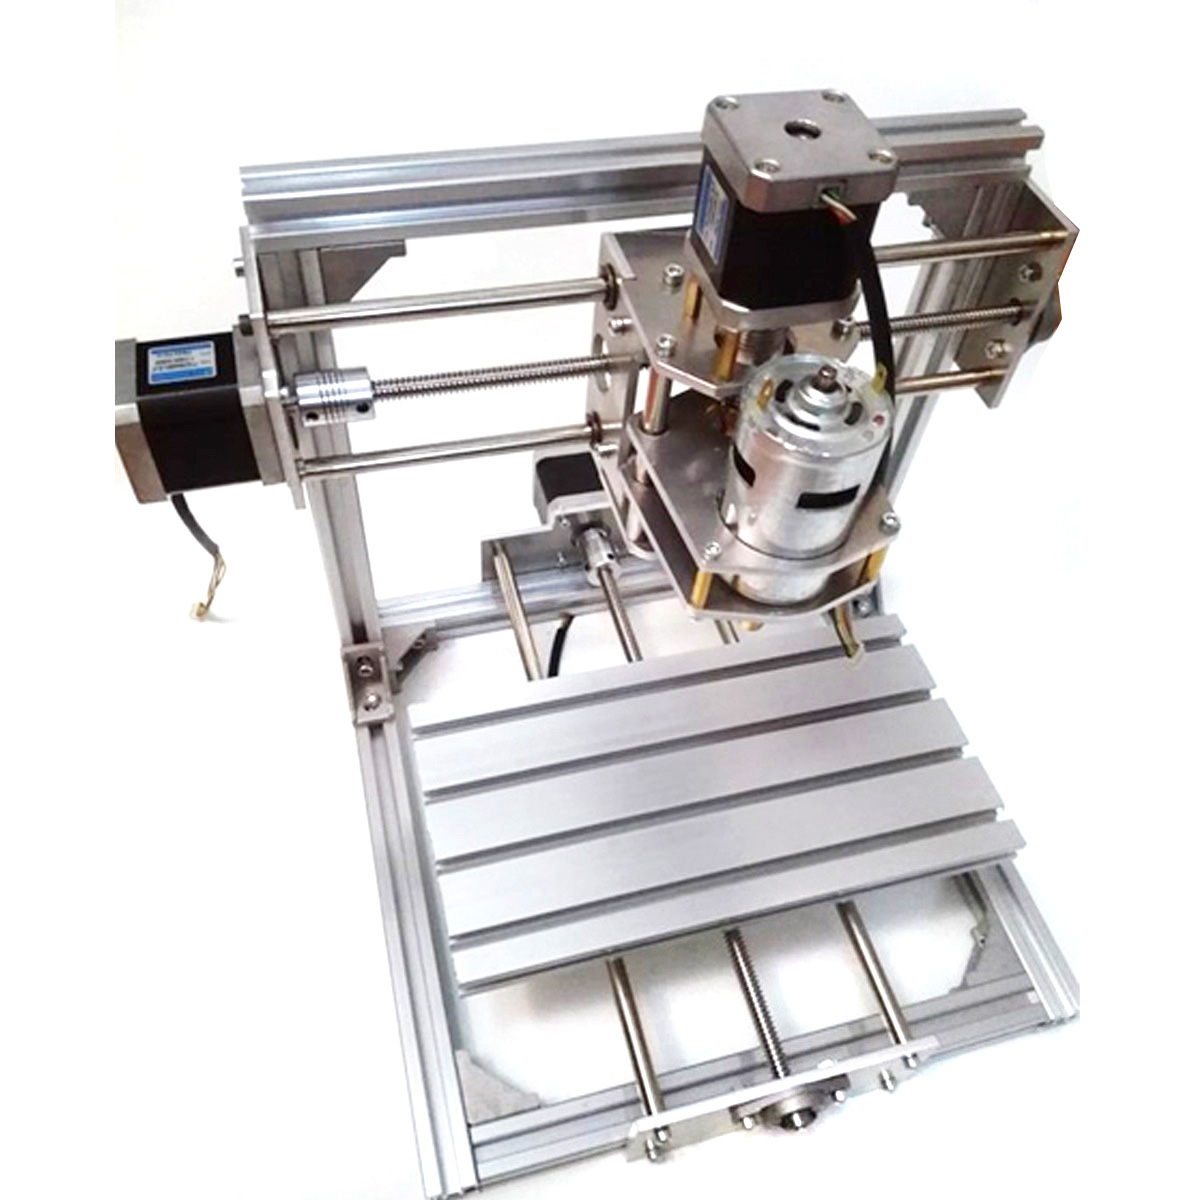 DIY 20x20cm Mini 3 Axis CNC Engraver Machine PCB Milling Wood Carving Engraving Router Kit Carving Machine Carving Stroke eur free tax cnc 6040z frame of engraving and milling machine for diy cnc router